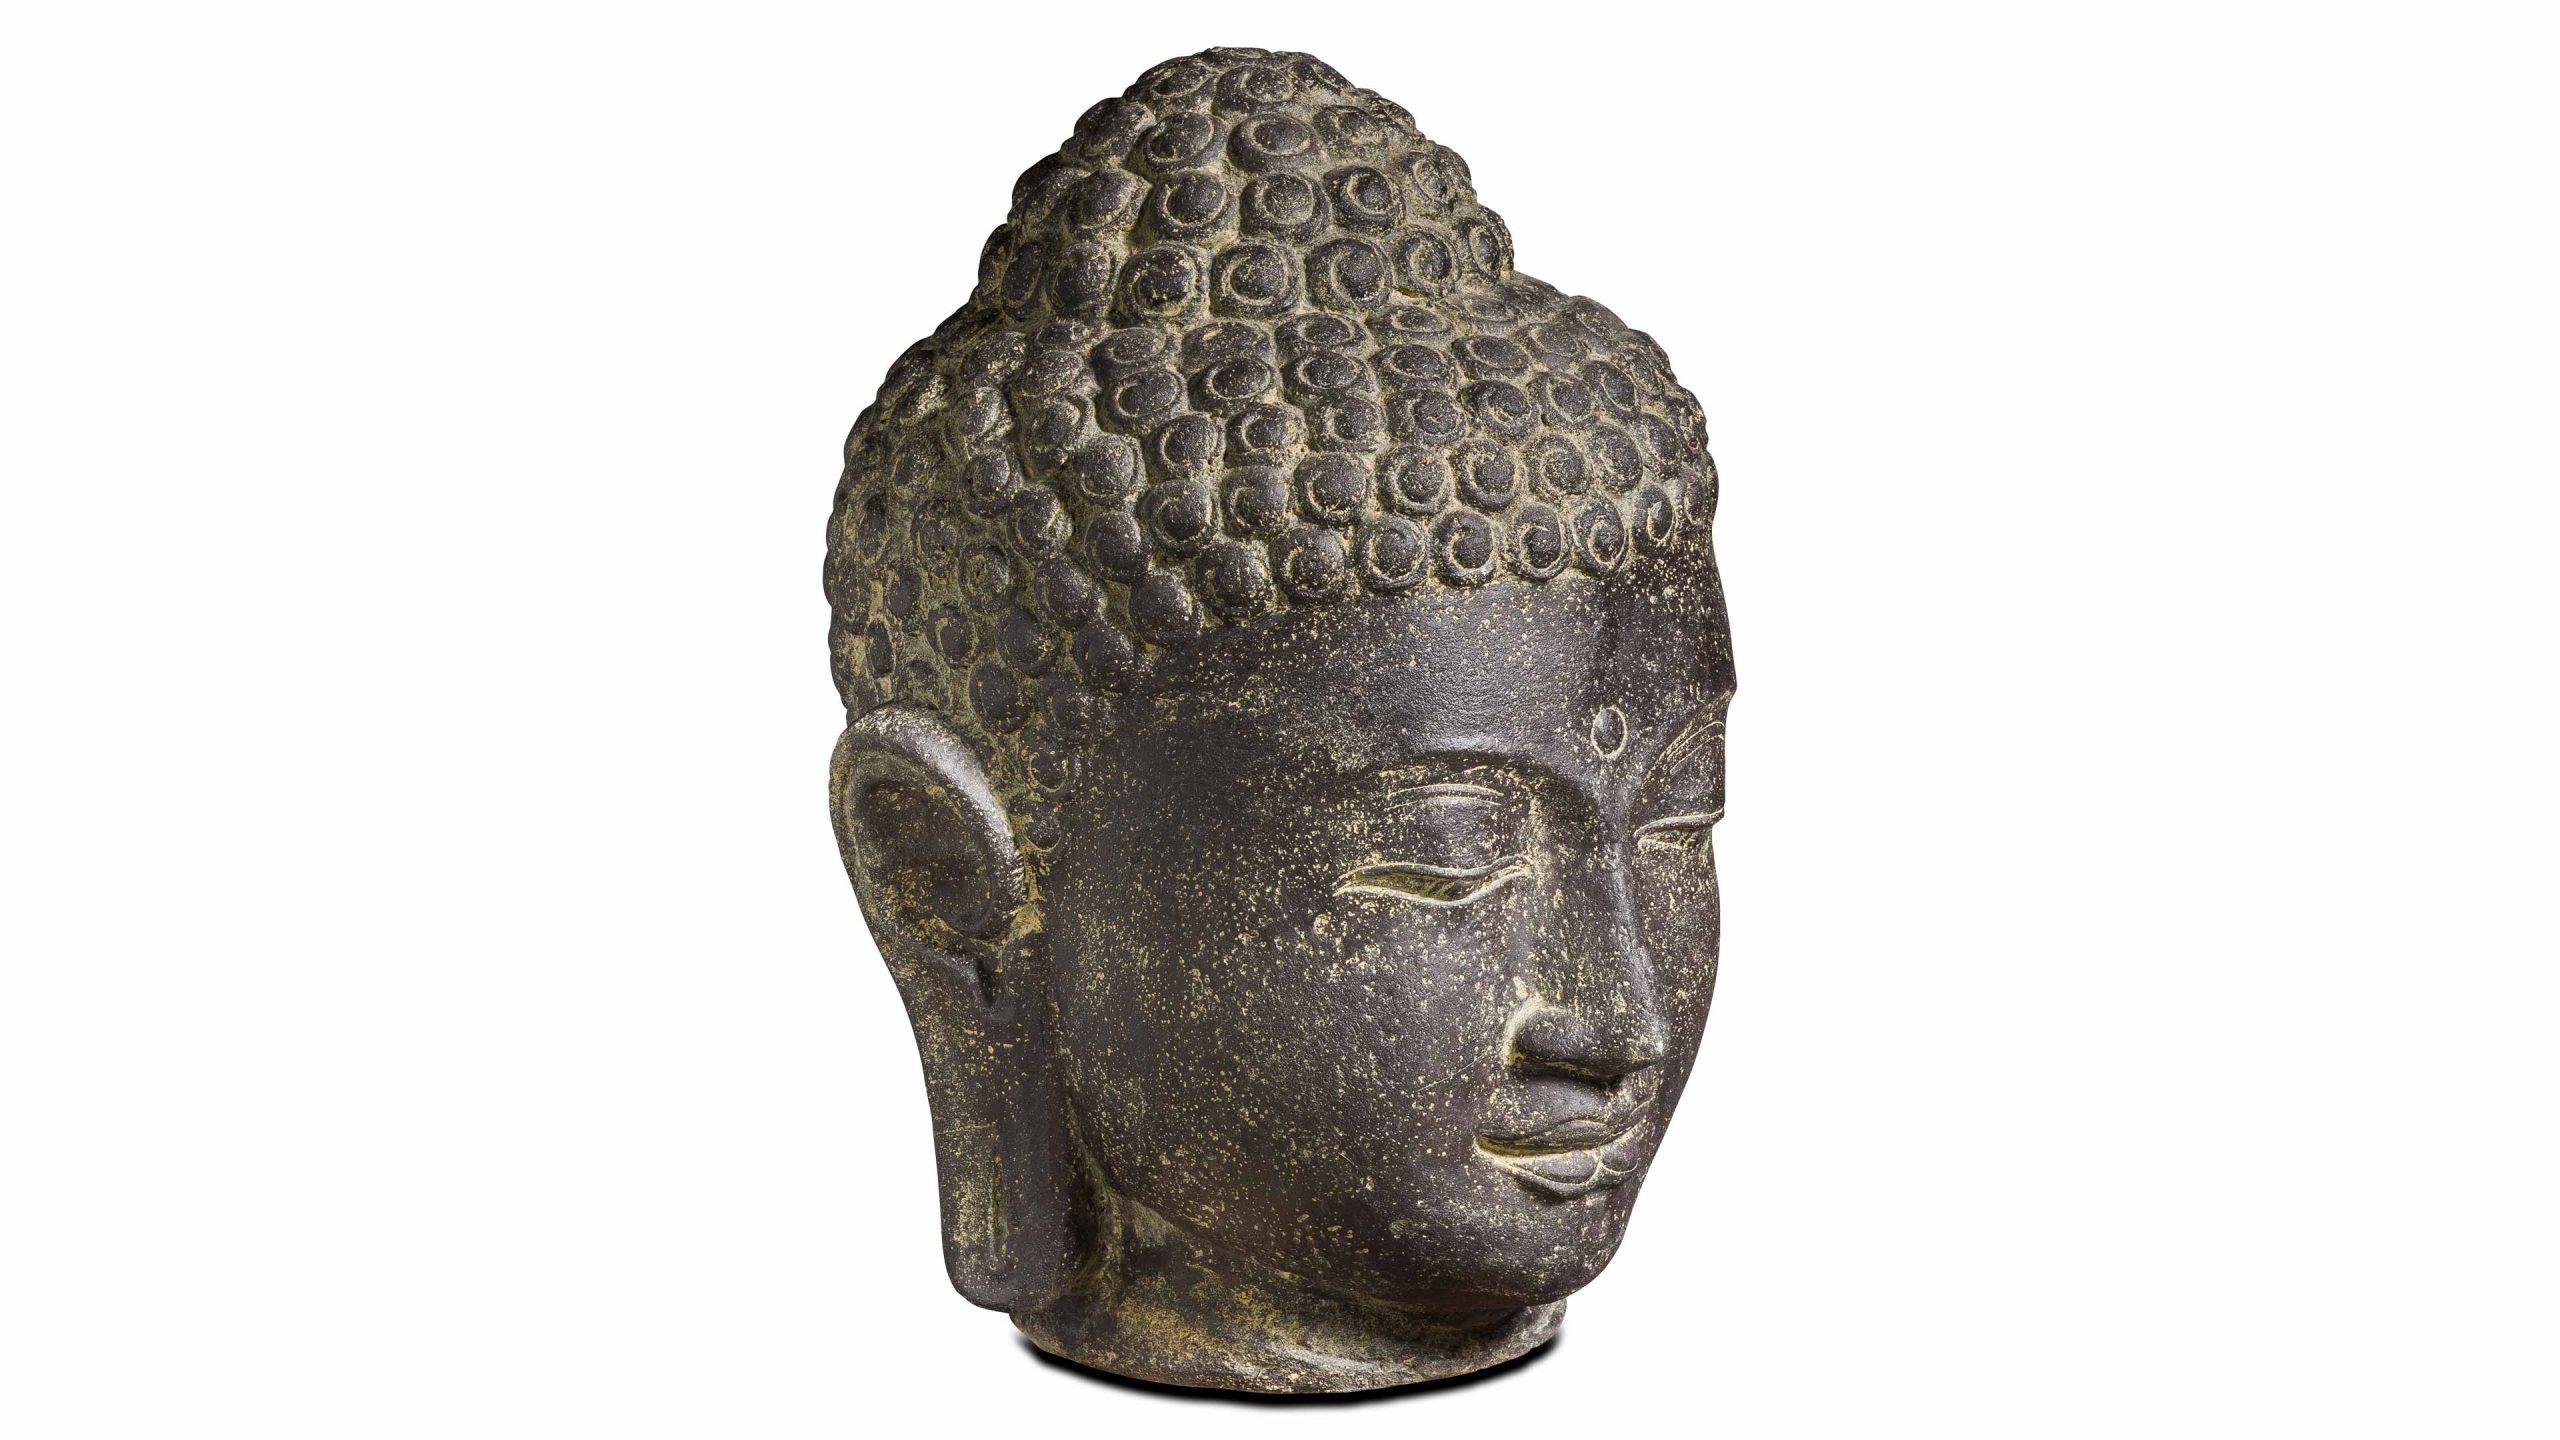 Statue De Jardin Tête De Bouddha En Pierre 60Cm | Oviala à Statue Bouddha Exterieur Pour Jardin